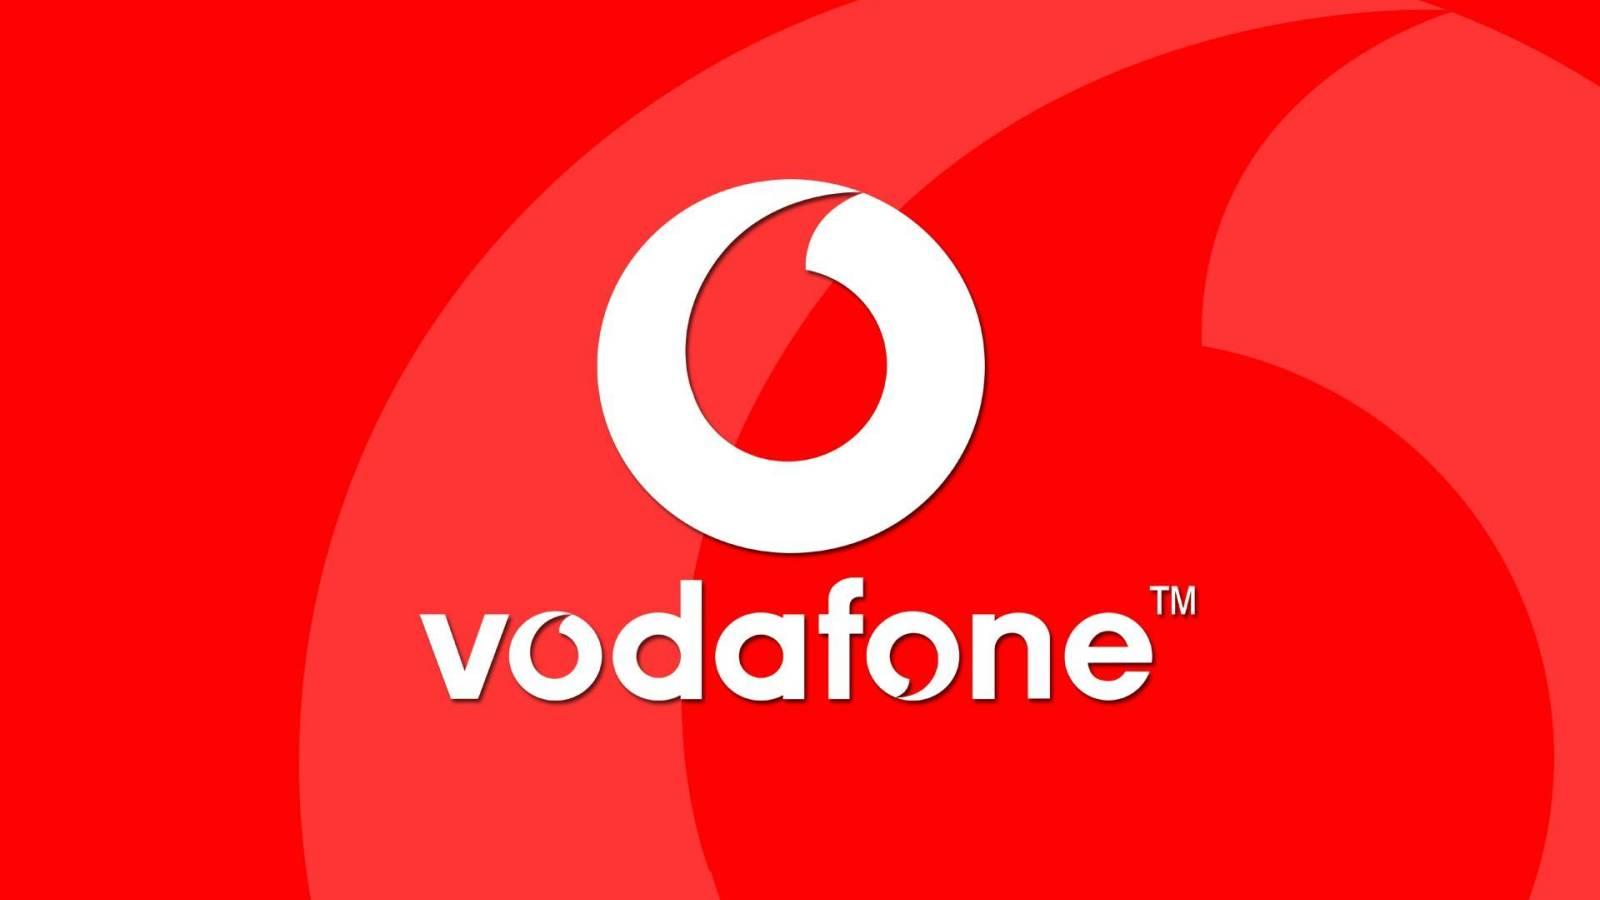 Vodafone motivare